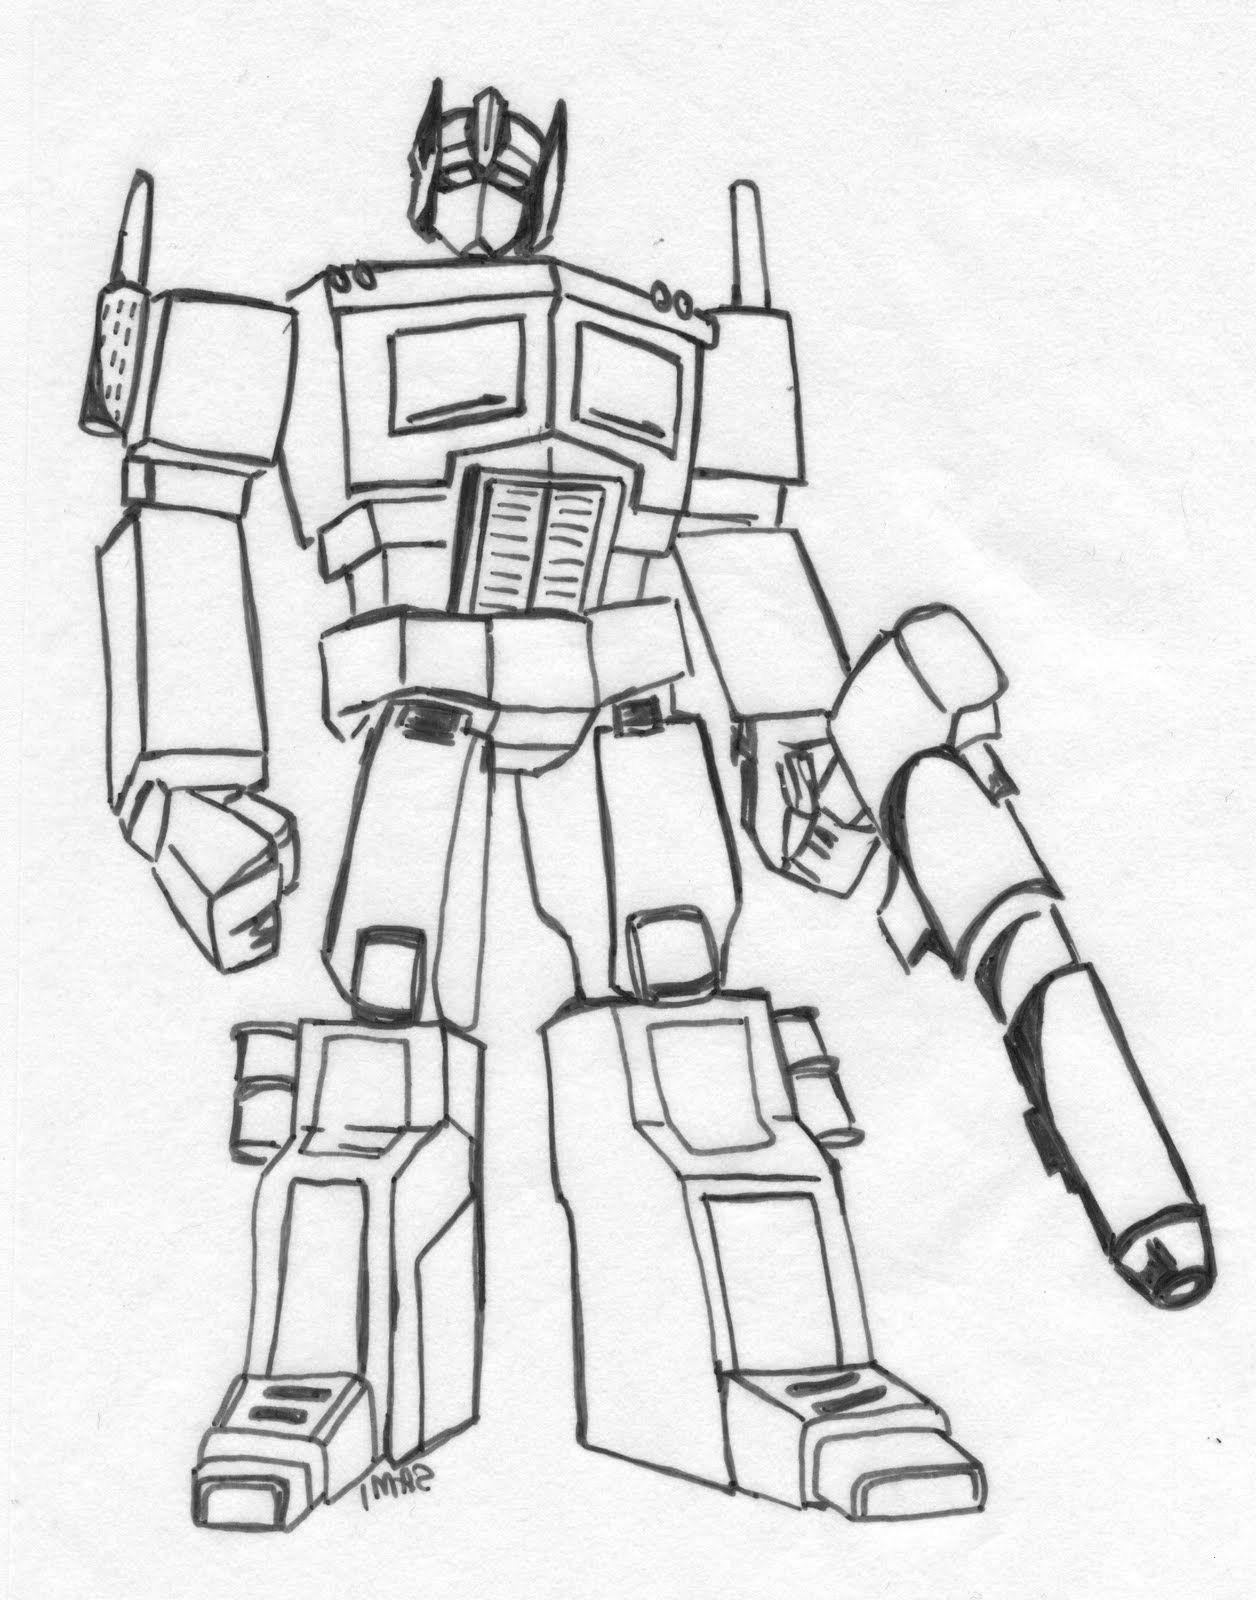 Ausmalbilder Transformers Optimus Prime Frisch 35 Neu Ausmalbilder Transformers – Malvorlagen Ideen Stock